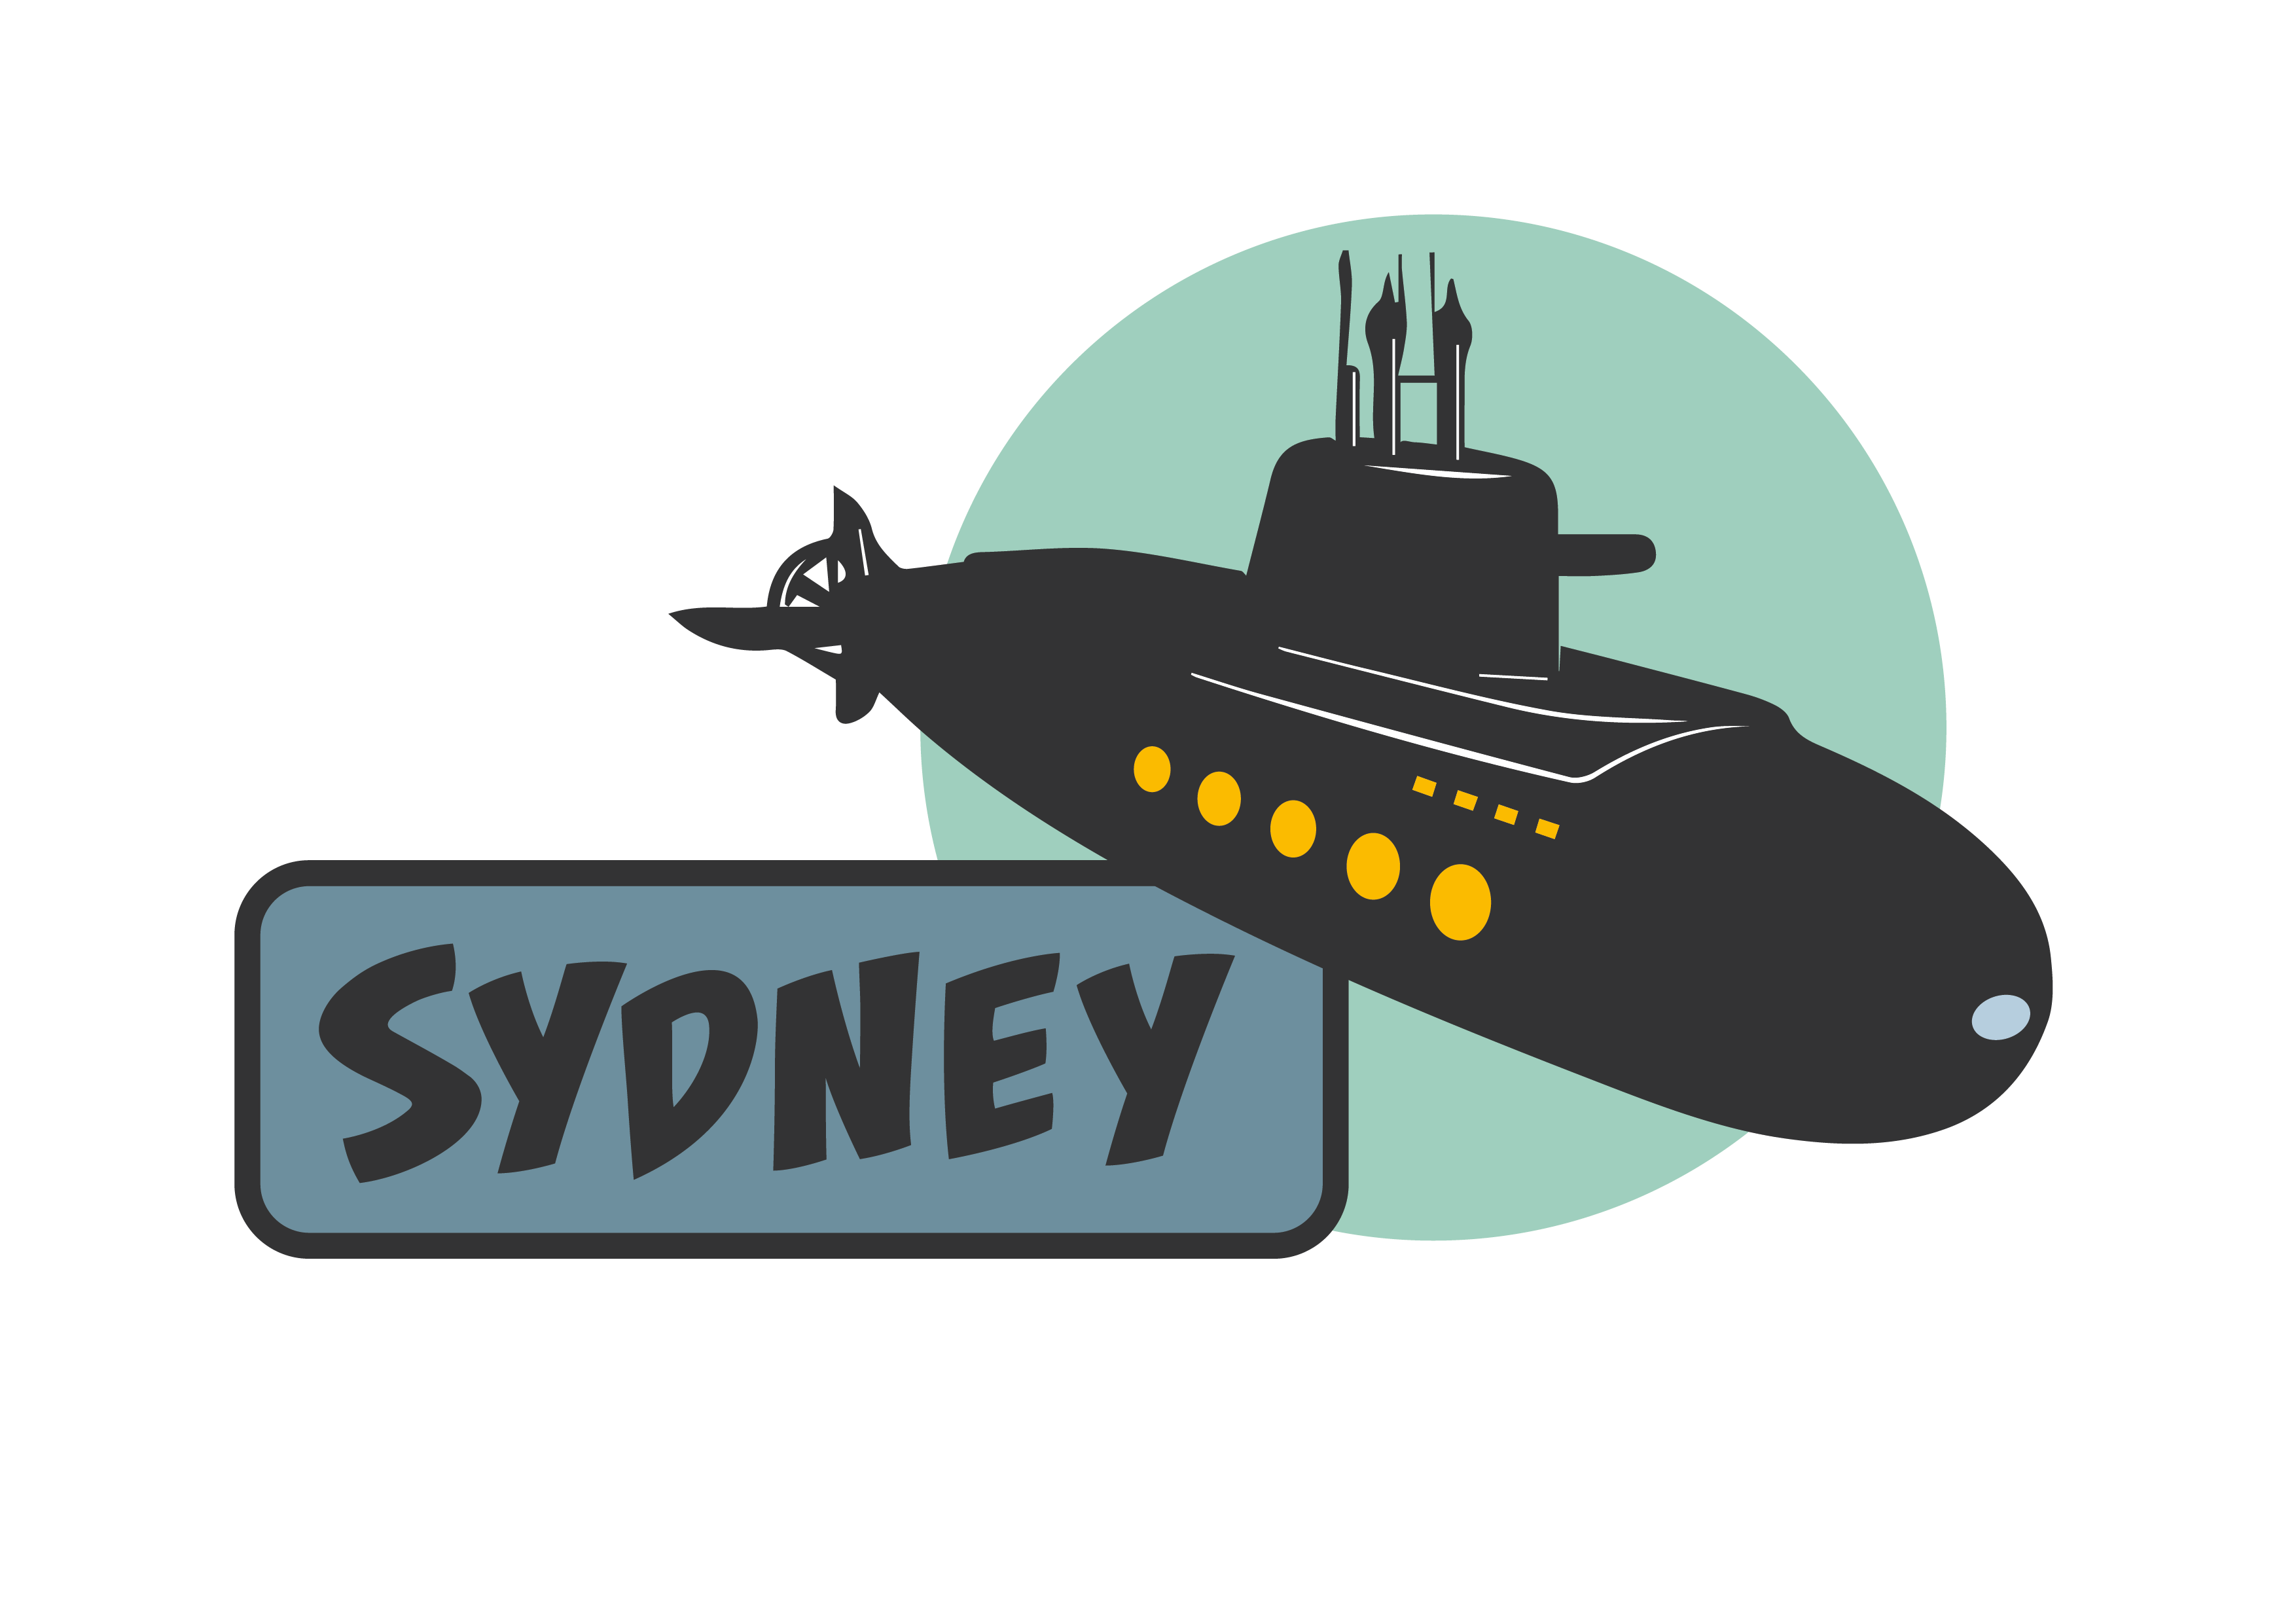 Sydney-01